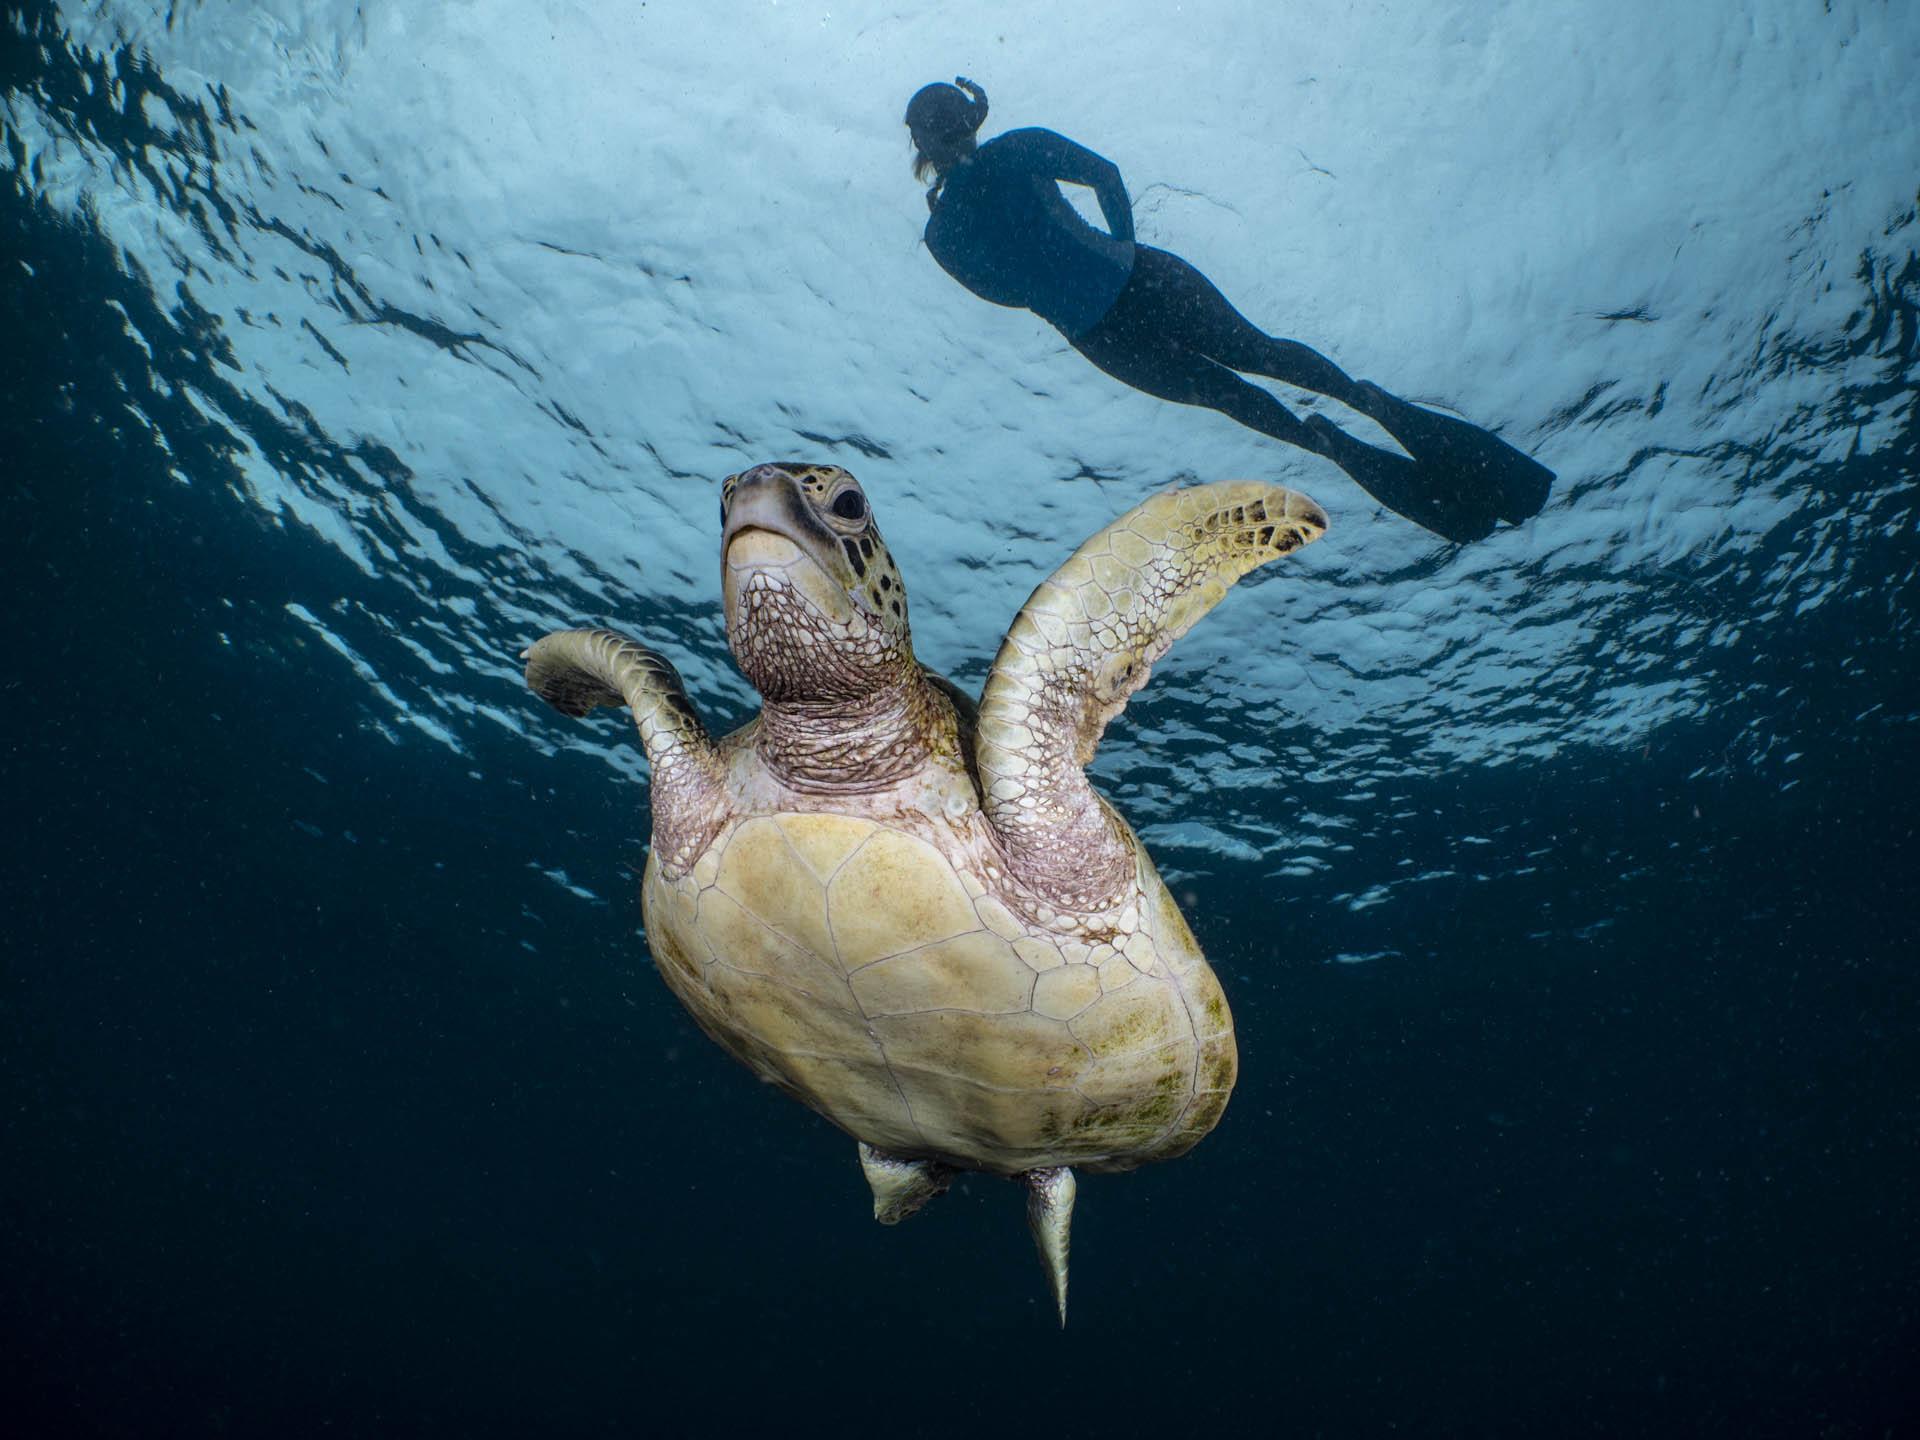 snorkeler floating above green sea turtle